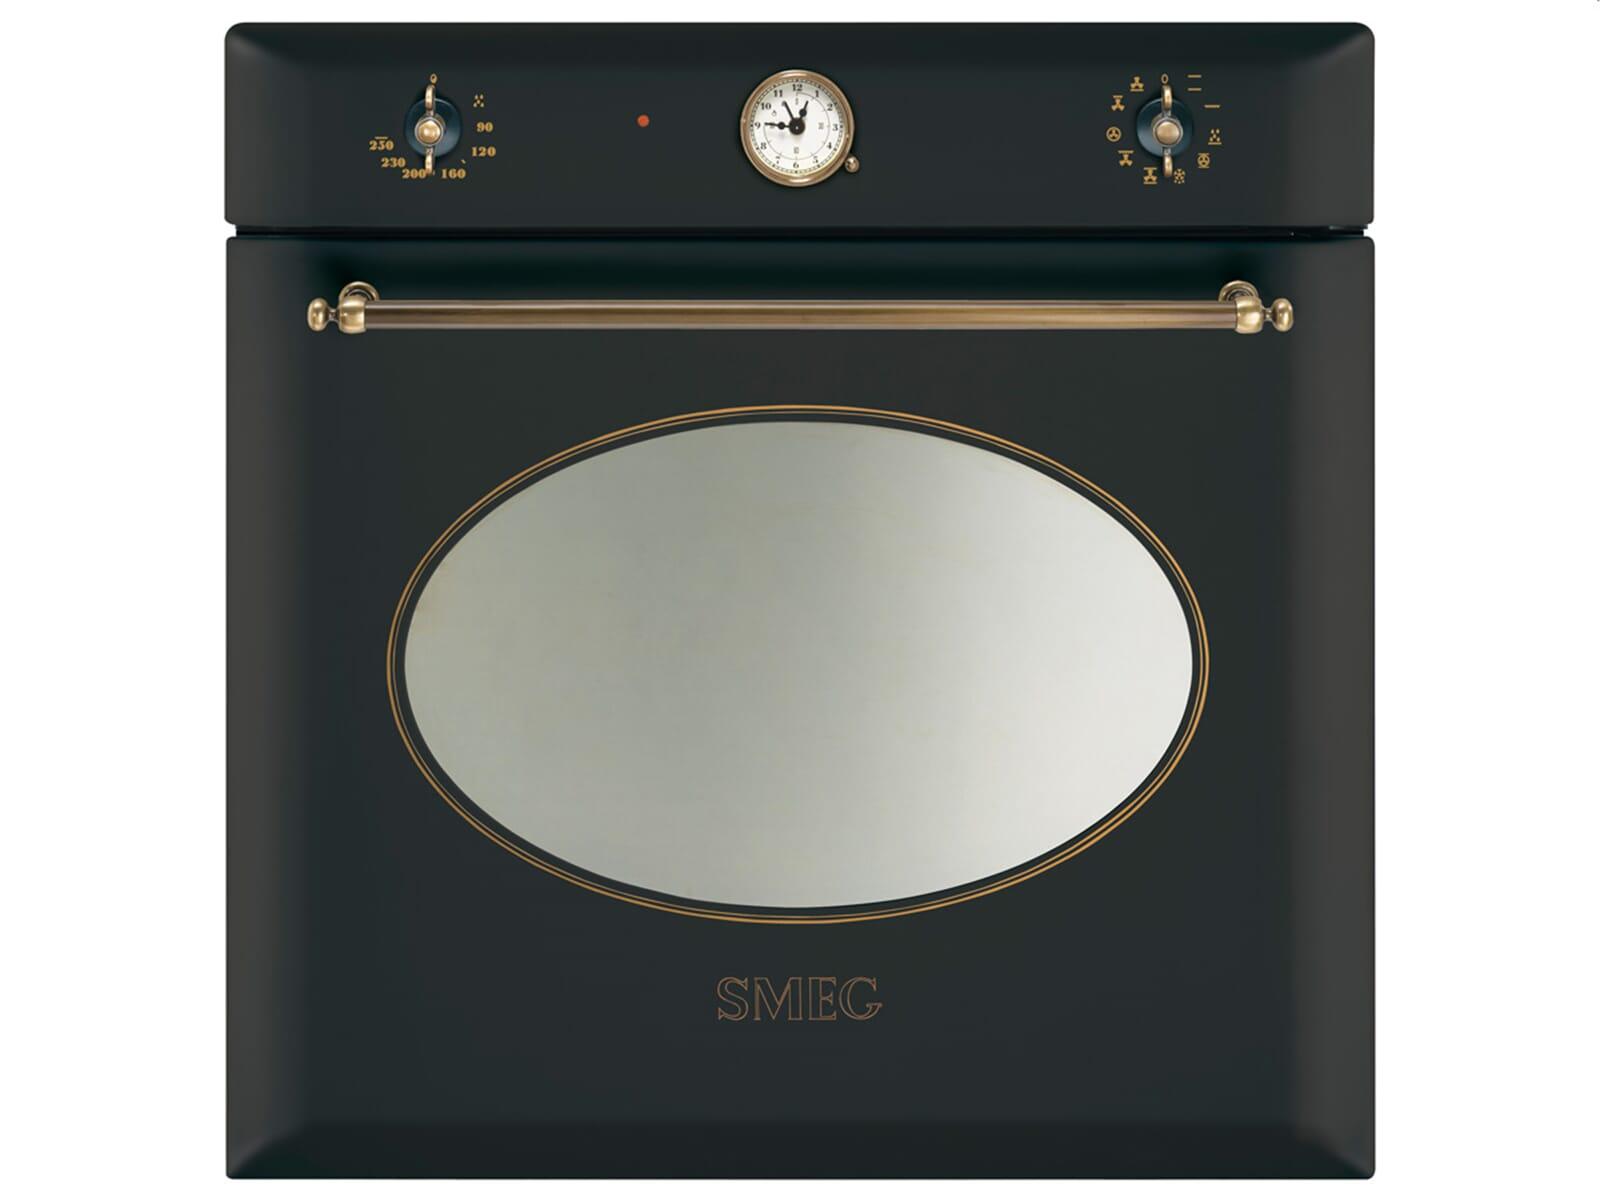 smeg sf855ao backofen anthrazit nostalgie einbaubackofen einbauherd schwarz ebay. Black Bedroom Furniture Sets. Home Design Ideas